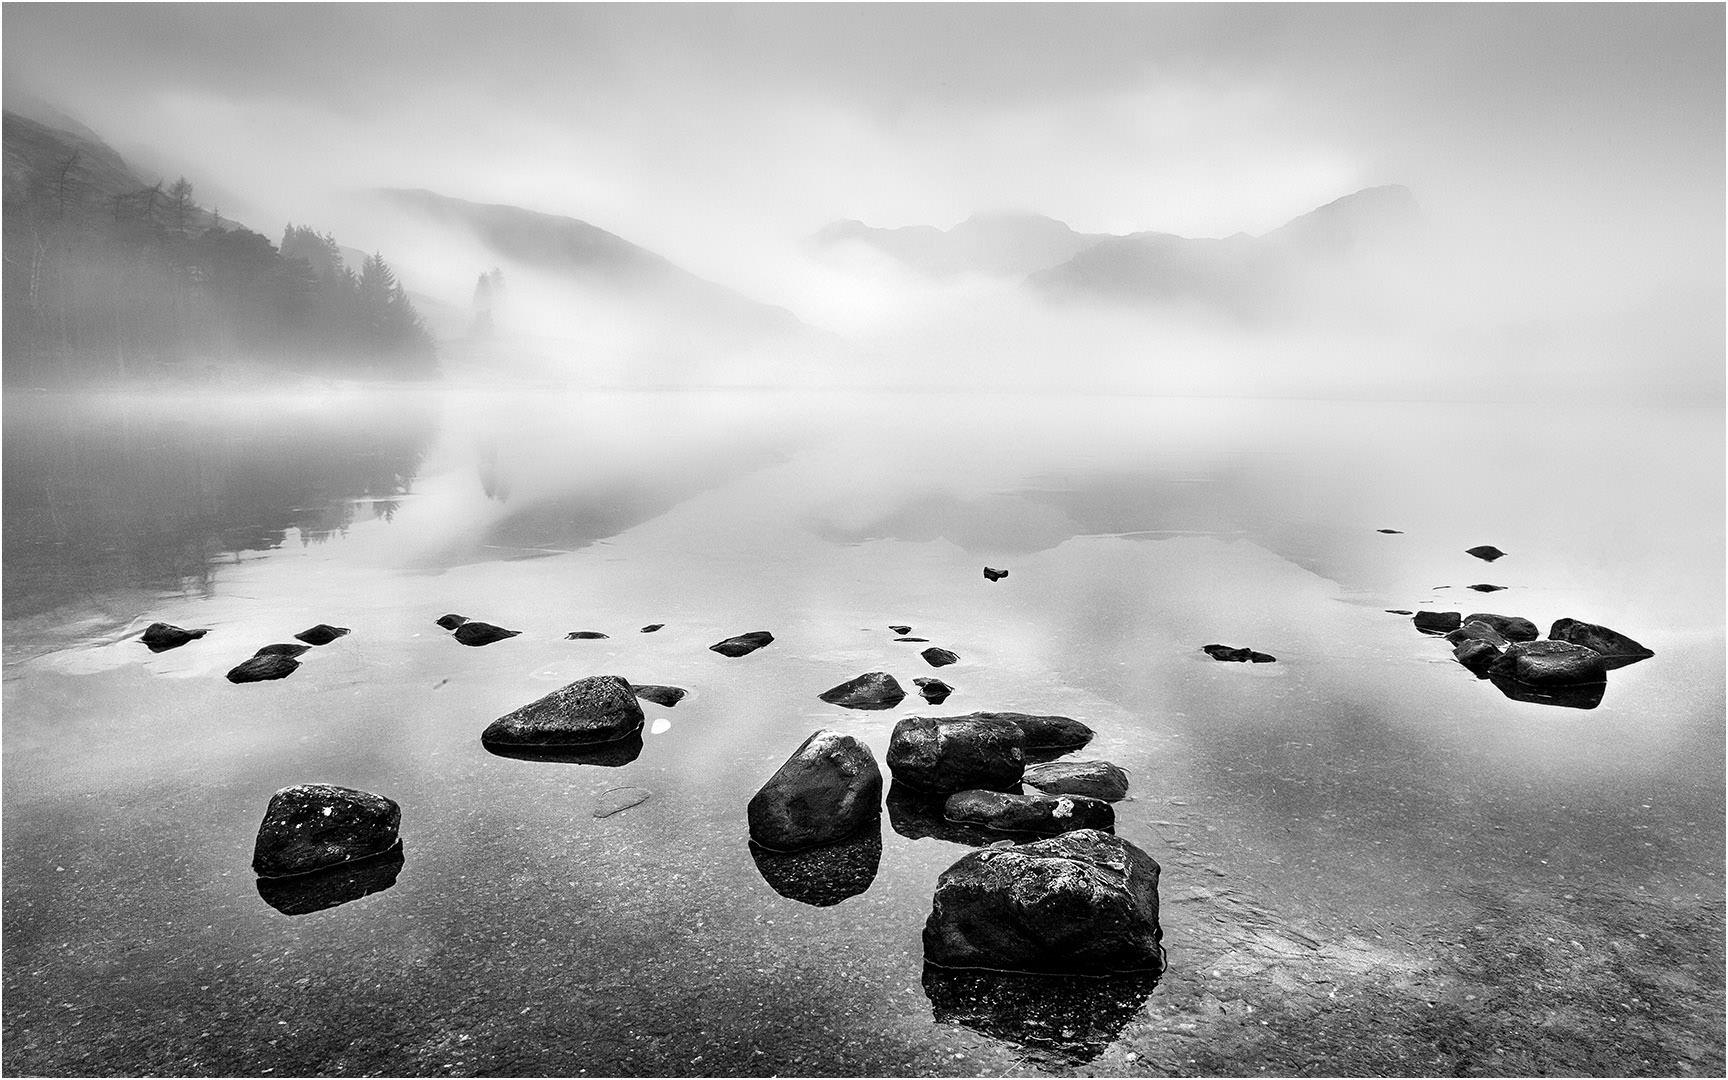 Fog on the Tarn